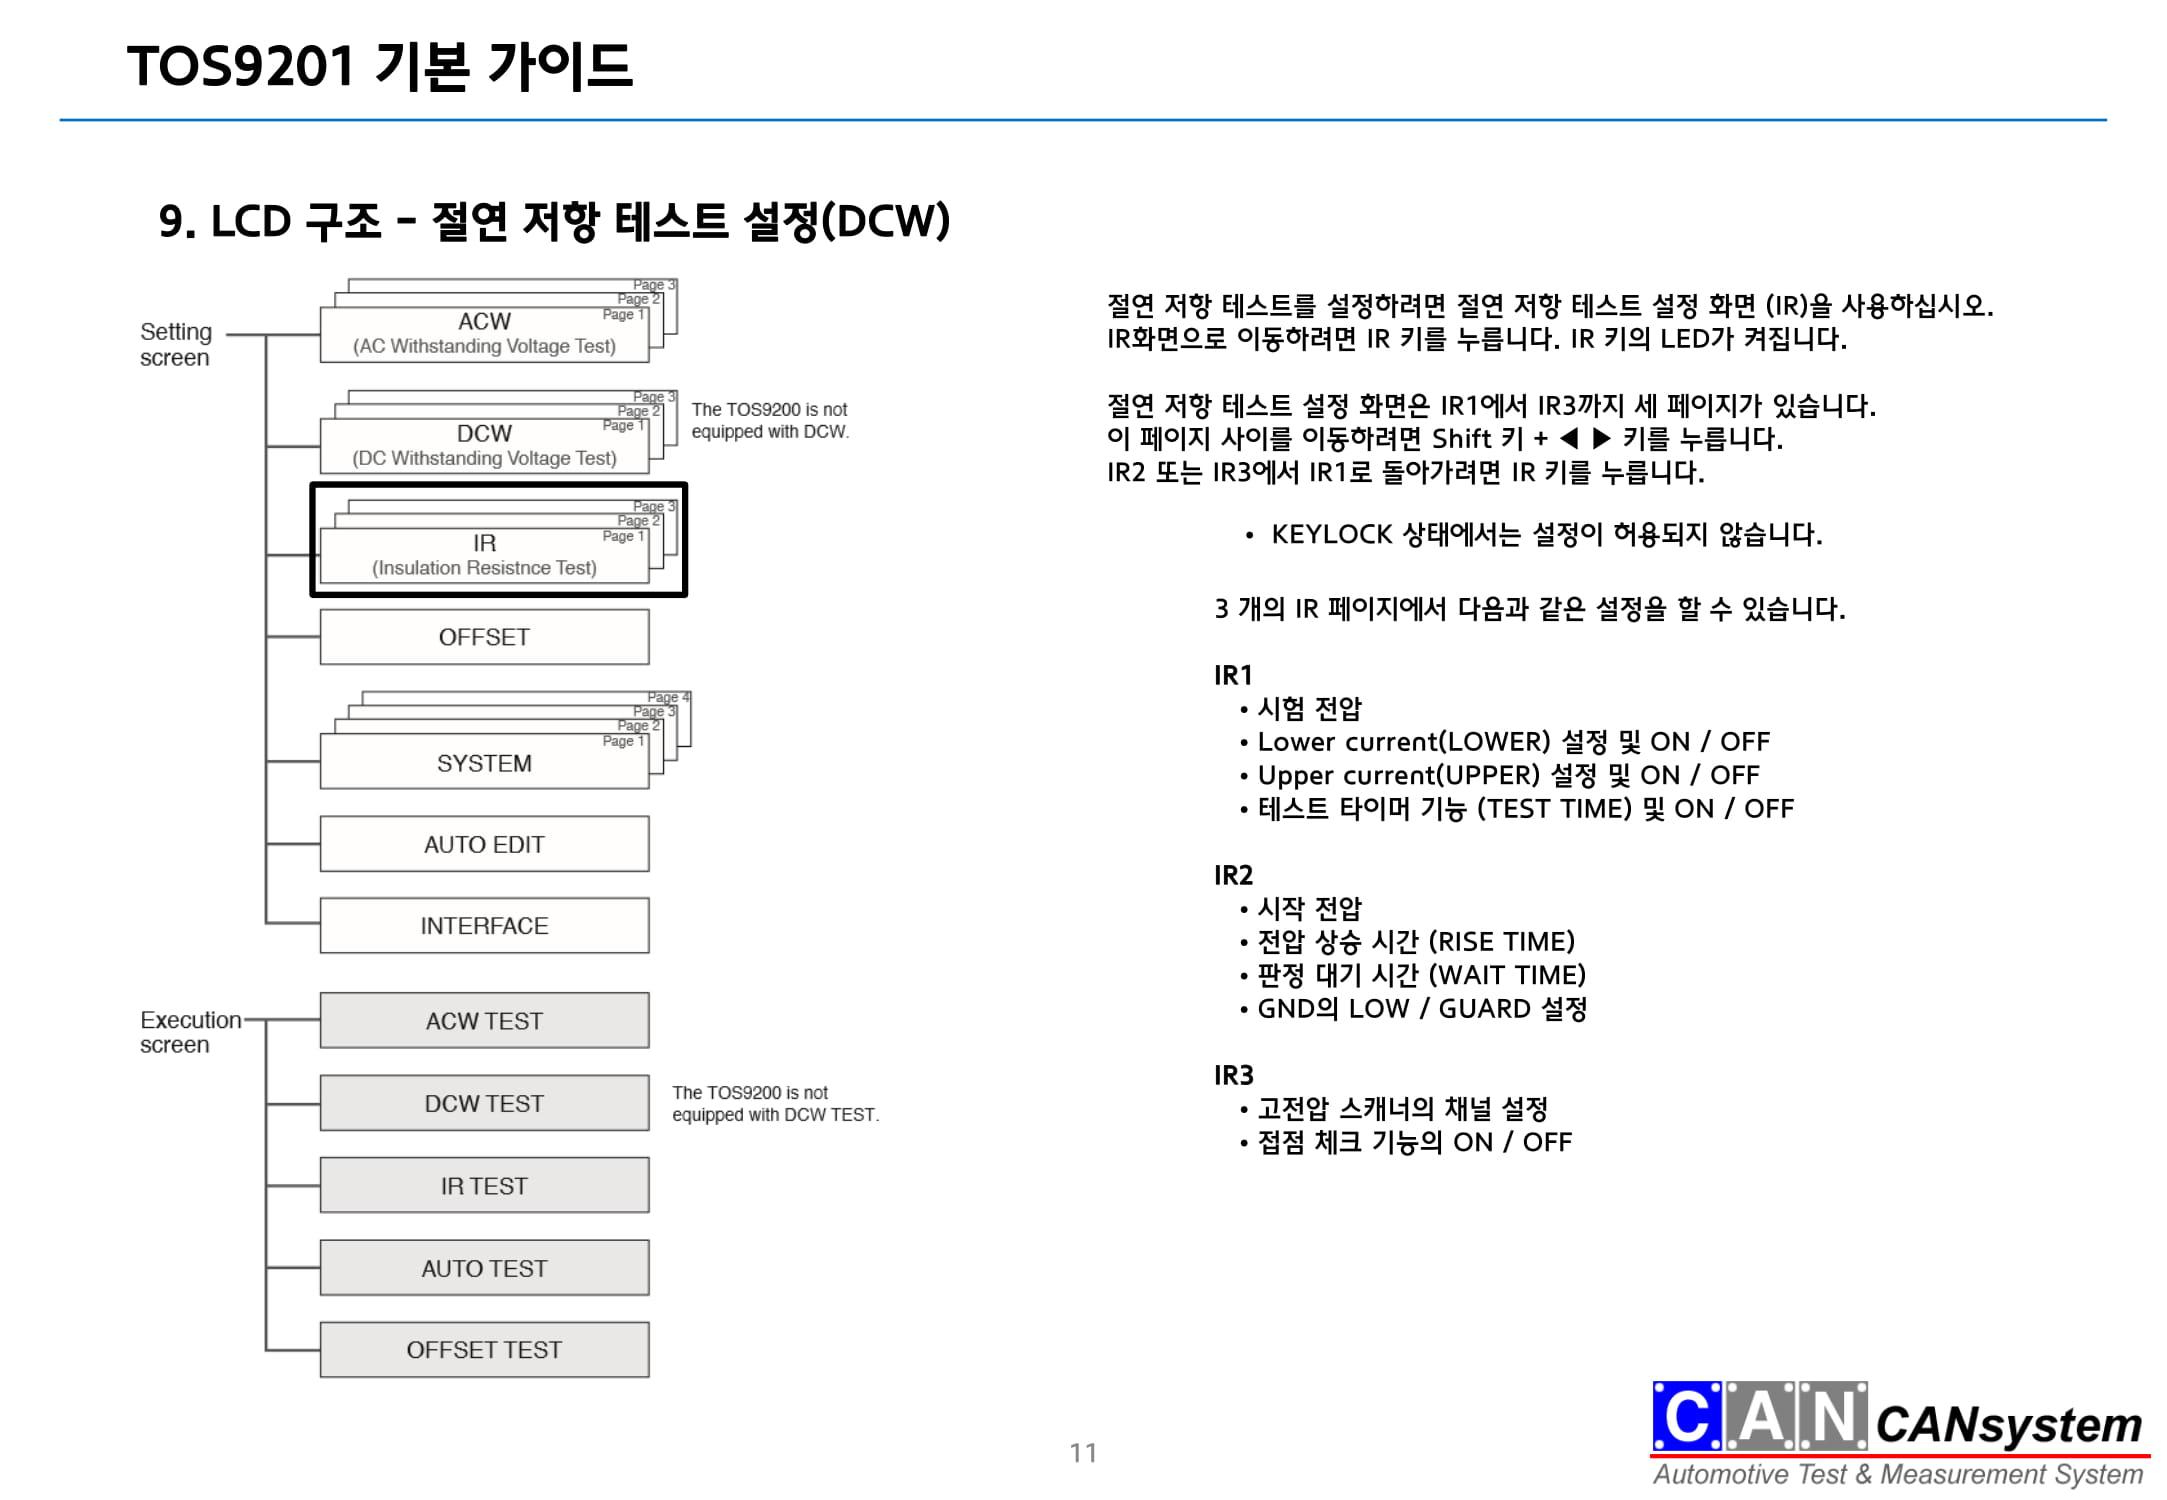 KIKUSUI TOS9201 국문 이용가이드-11.jpg